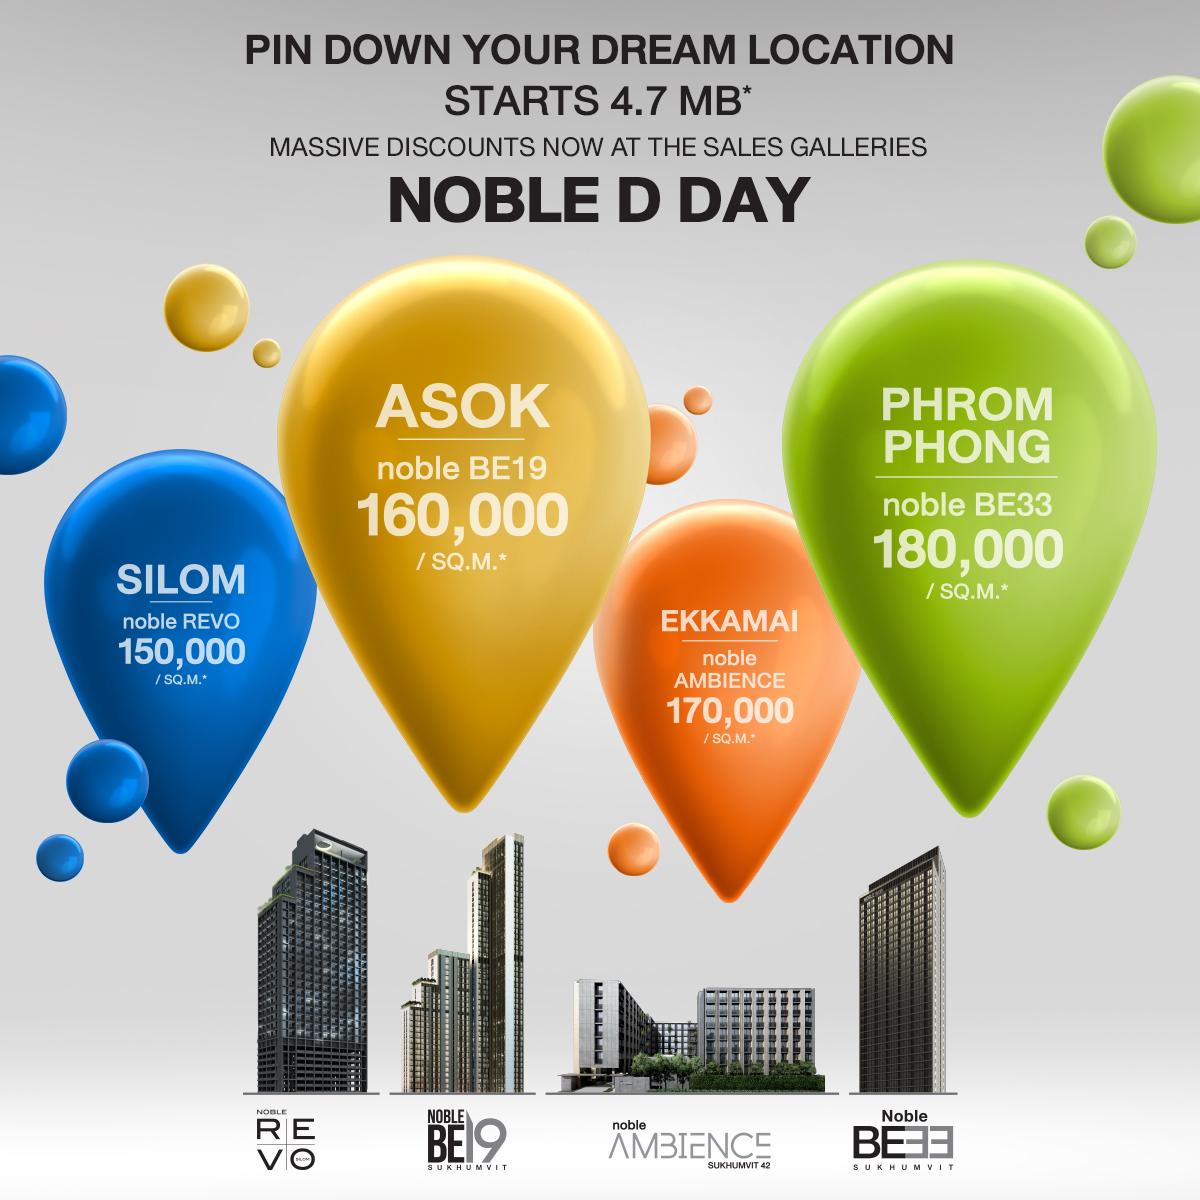 """ Noble D Day "" โปรใหม่ล่าสุดจากโนเบิลฯ รวมคอนโดโลเคชั่นในฝันติดรถไฟฟ้า เริ่ม 4.7 ล้านบาท* 13 -"